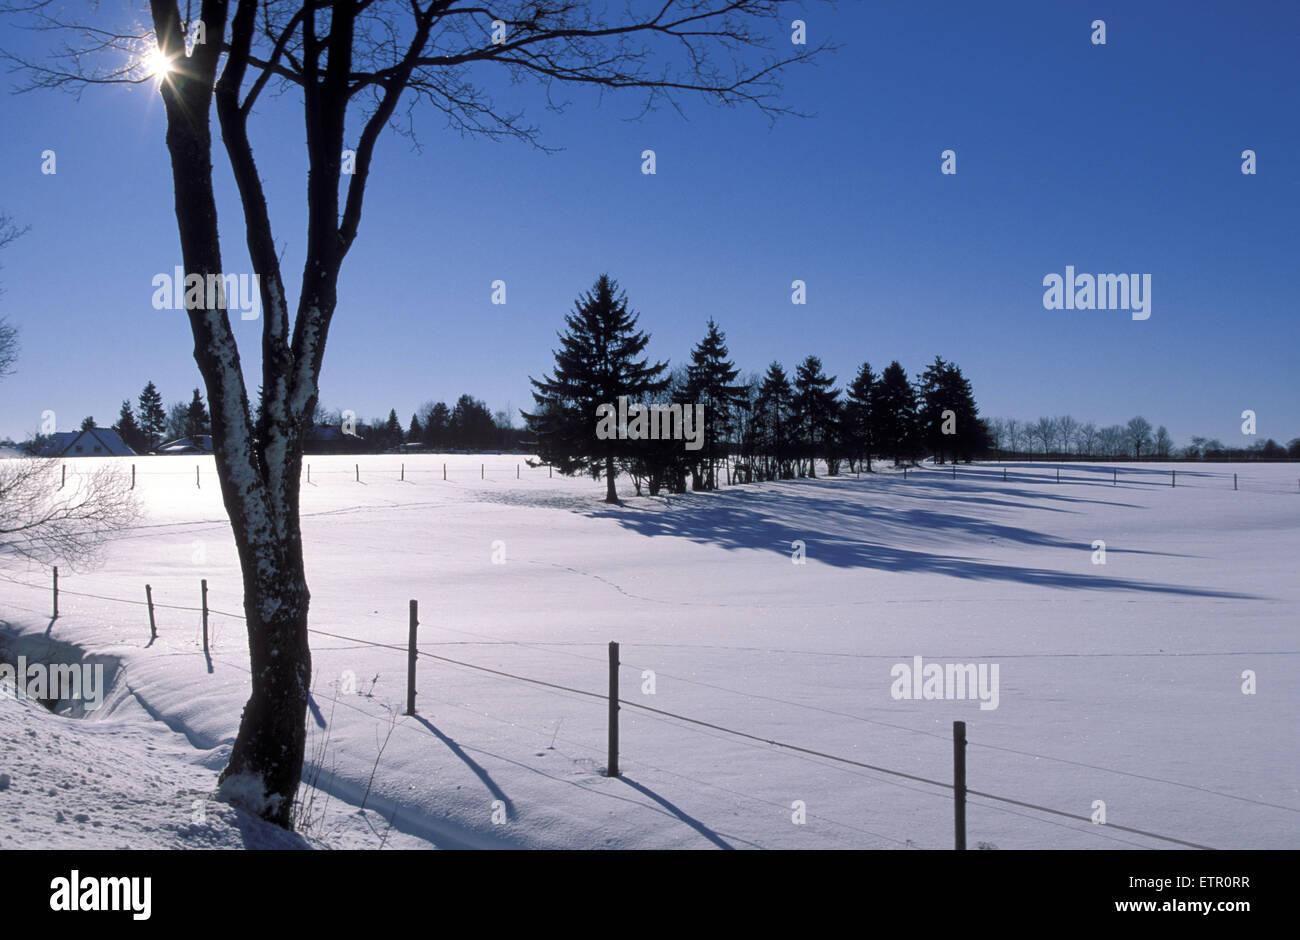 Europe, Belgium, winter at the high-moor Hohes Venn, spruces  EuropaL, Belgien, das Hochmoor Hohes Venn, das verschneite - Stock Image